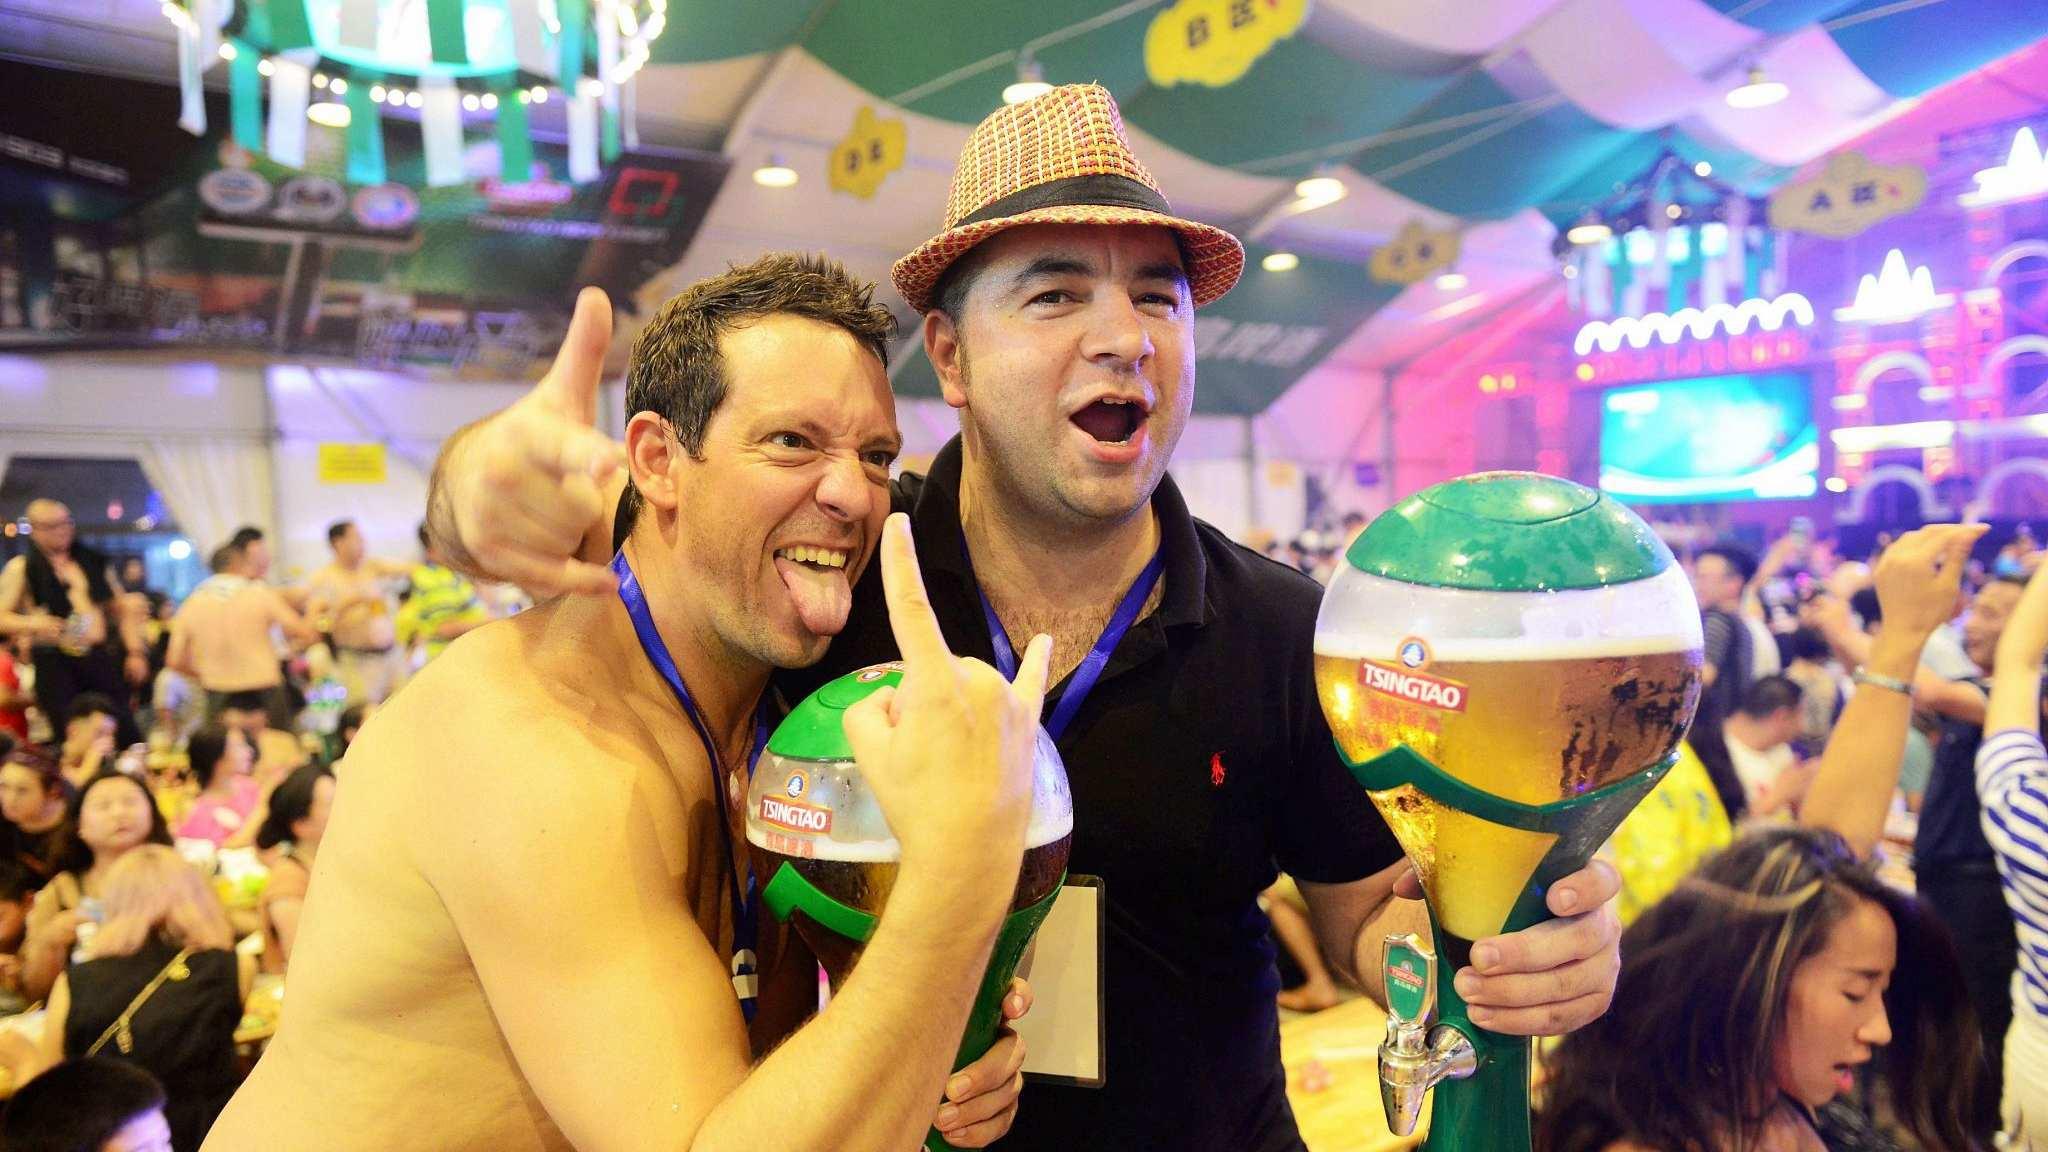 Qingdao to host annual international beer festival: Asia's Oktoberfest